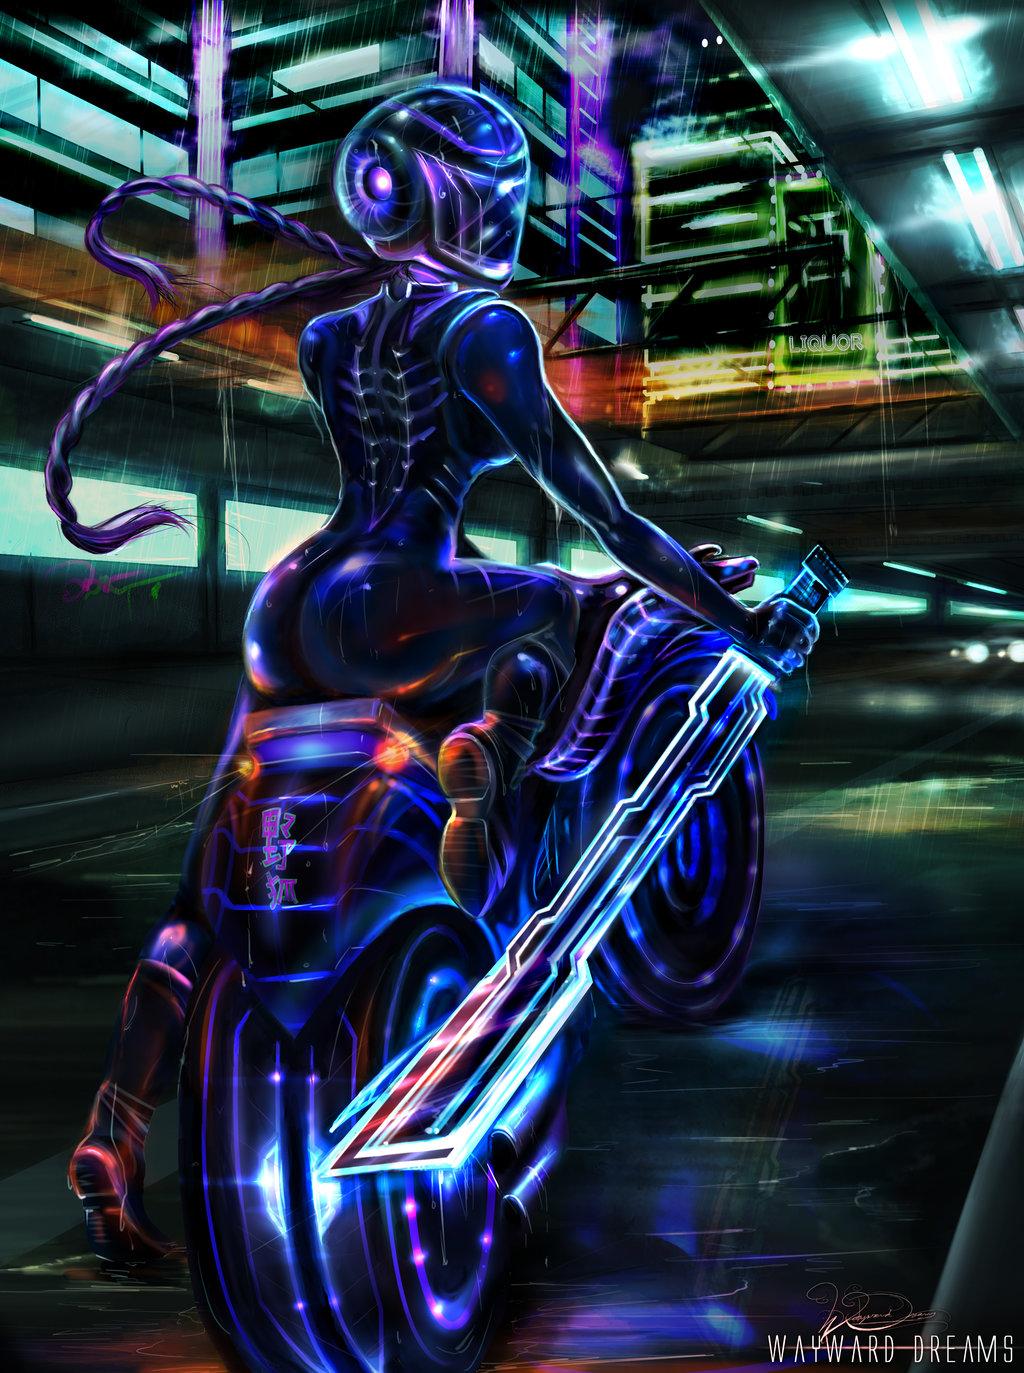 General 1024x1373 Sarah Turner drawing women helmet long hair braids boots weapon sword motorcycle glowing neon glow cyberpunk rain night